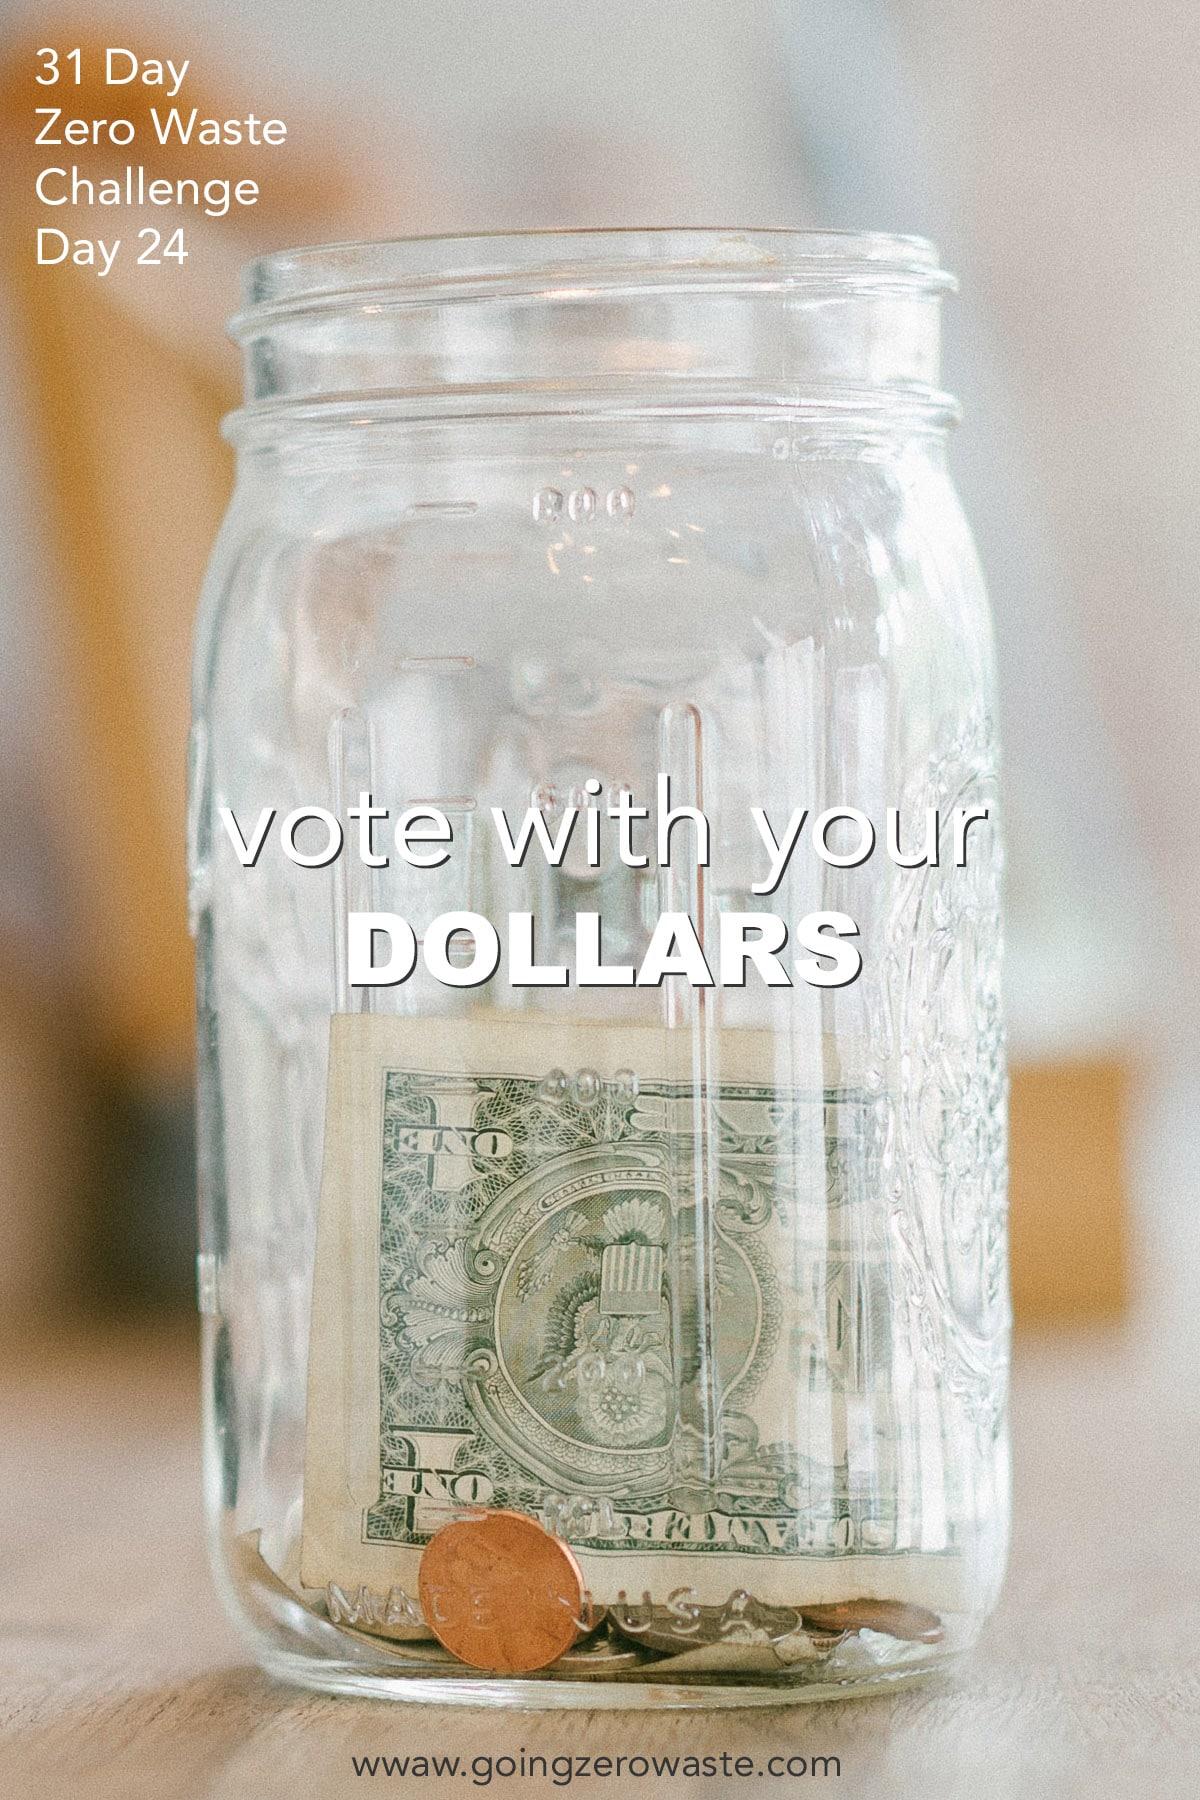 Vote With Your Dollars - Day 24 of the Zero Waste Challenge from www.goingzerowaste.com #zerowaste #ecofriendly #gogreen #sustainable #zerowastechallenge #challenge #sustainablelivingchallenge #votewithyourdollars